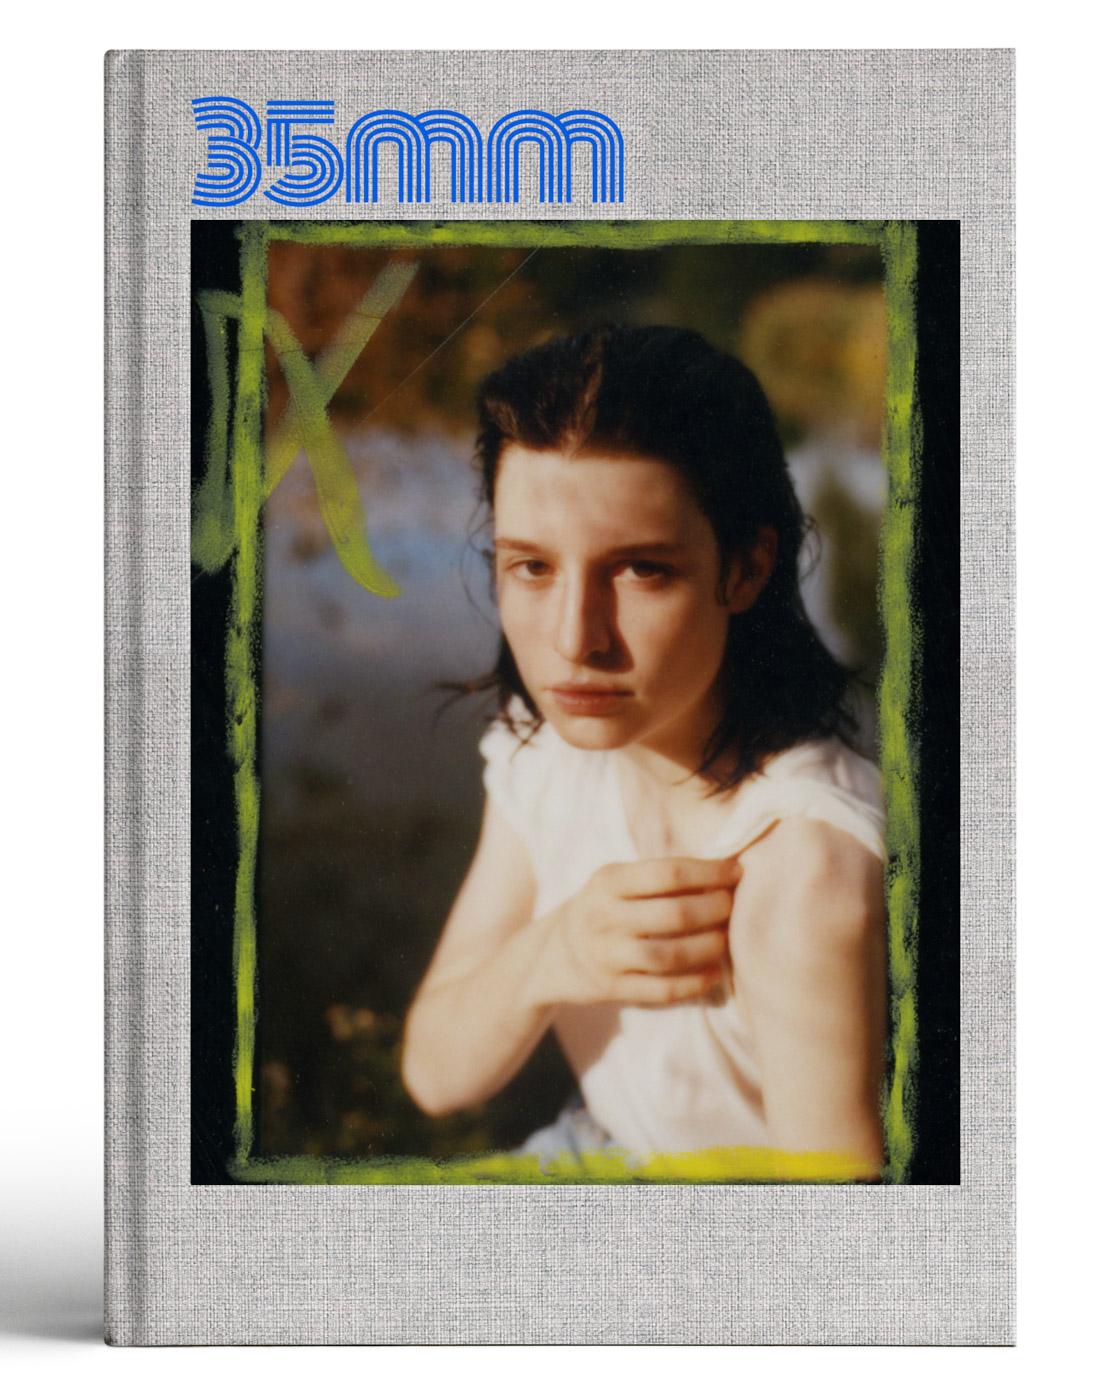 35mm_magazine_book_issue_film_only01.jpg